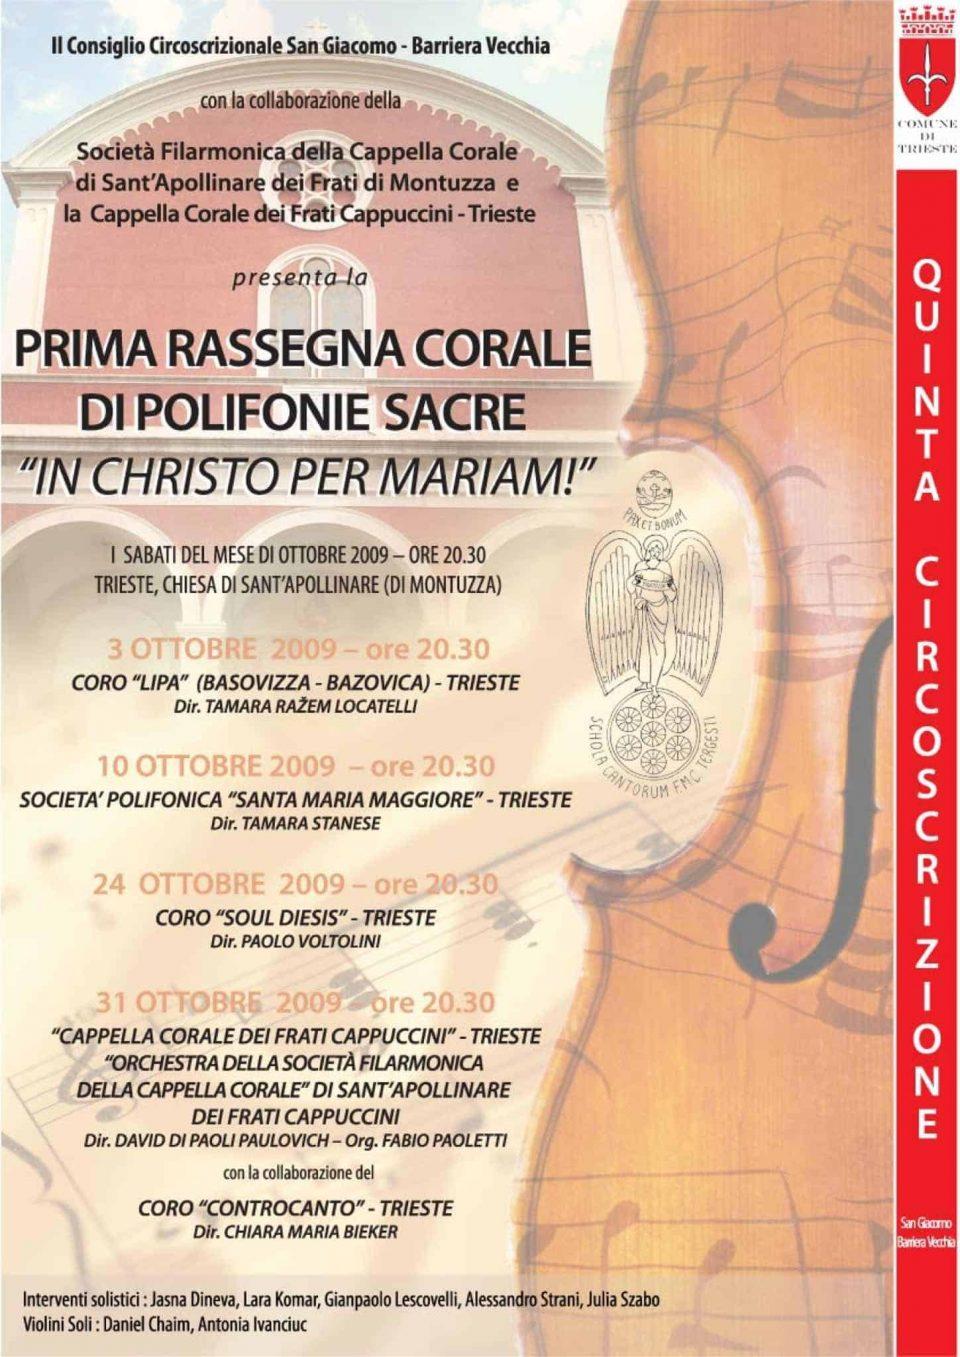 Manifesto Rassegna corale di musica sacra Beata Vergine Maria